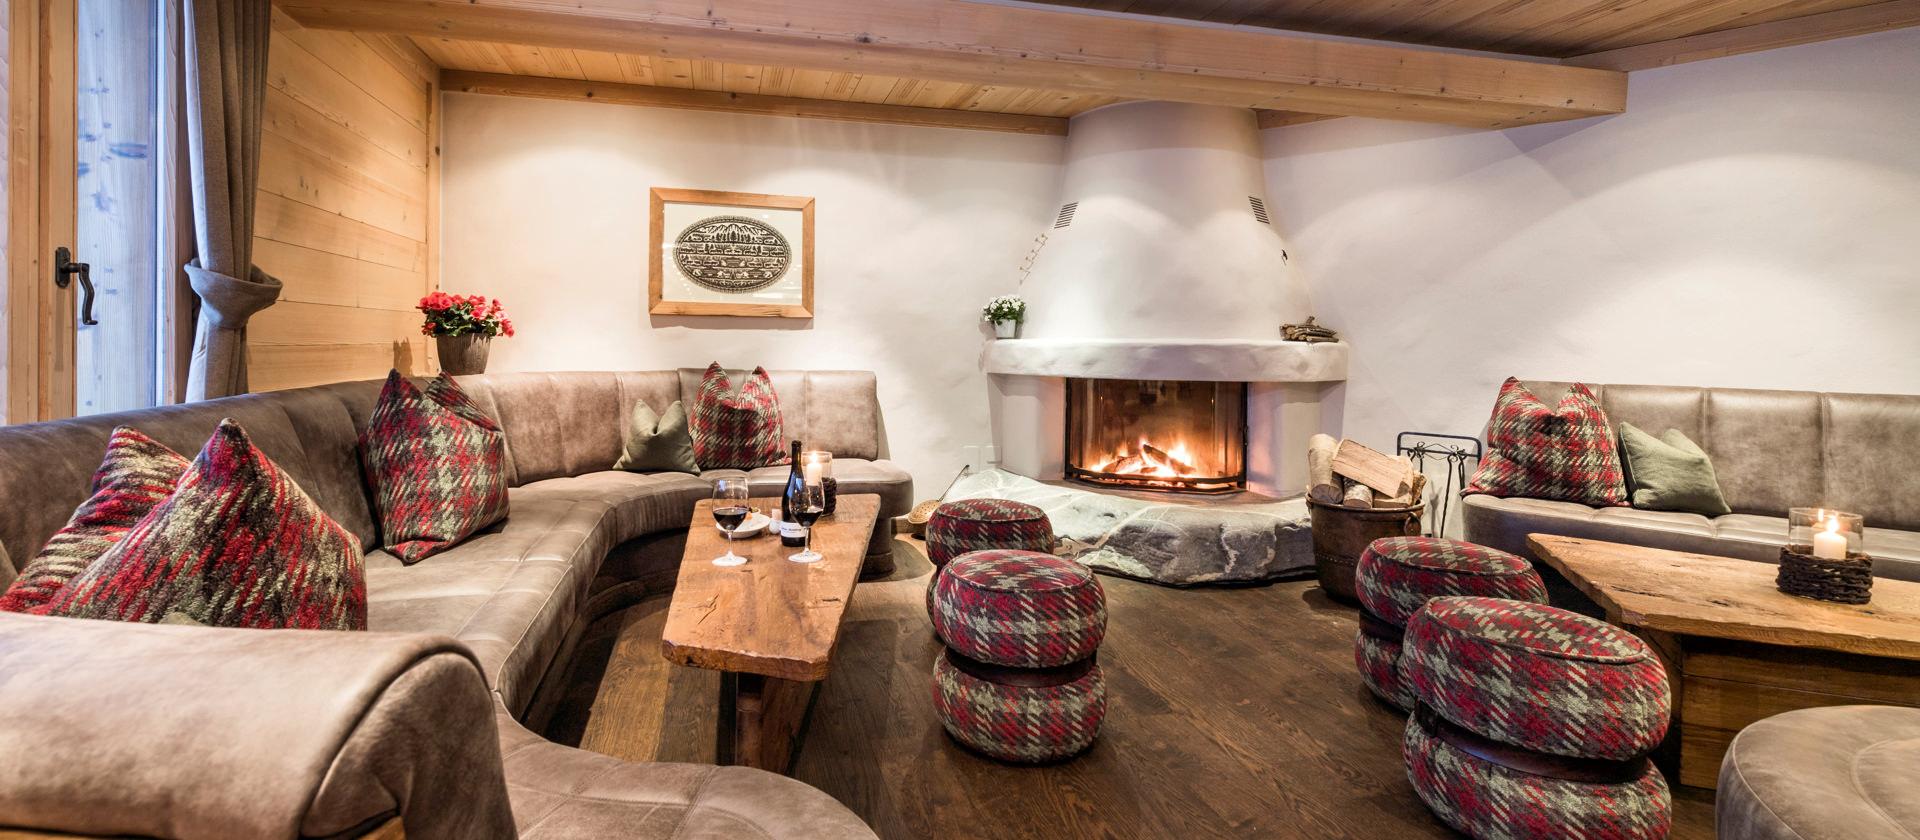 welcome to romantik hotel hornberg romantik hotel. Black Bedroom Furniture Sets. Home Design Ideas